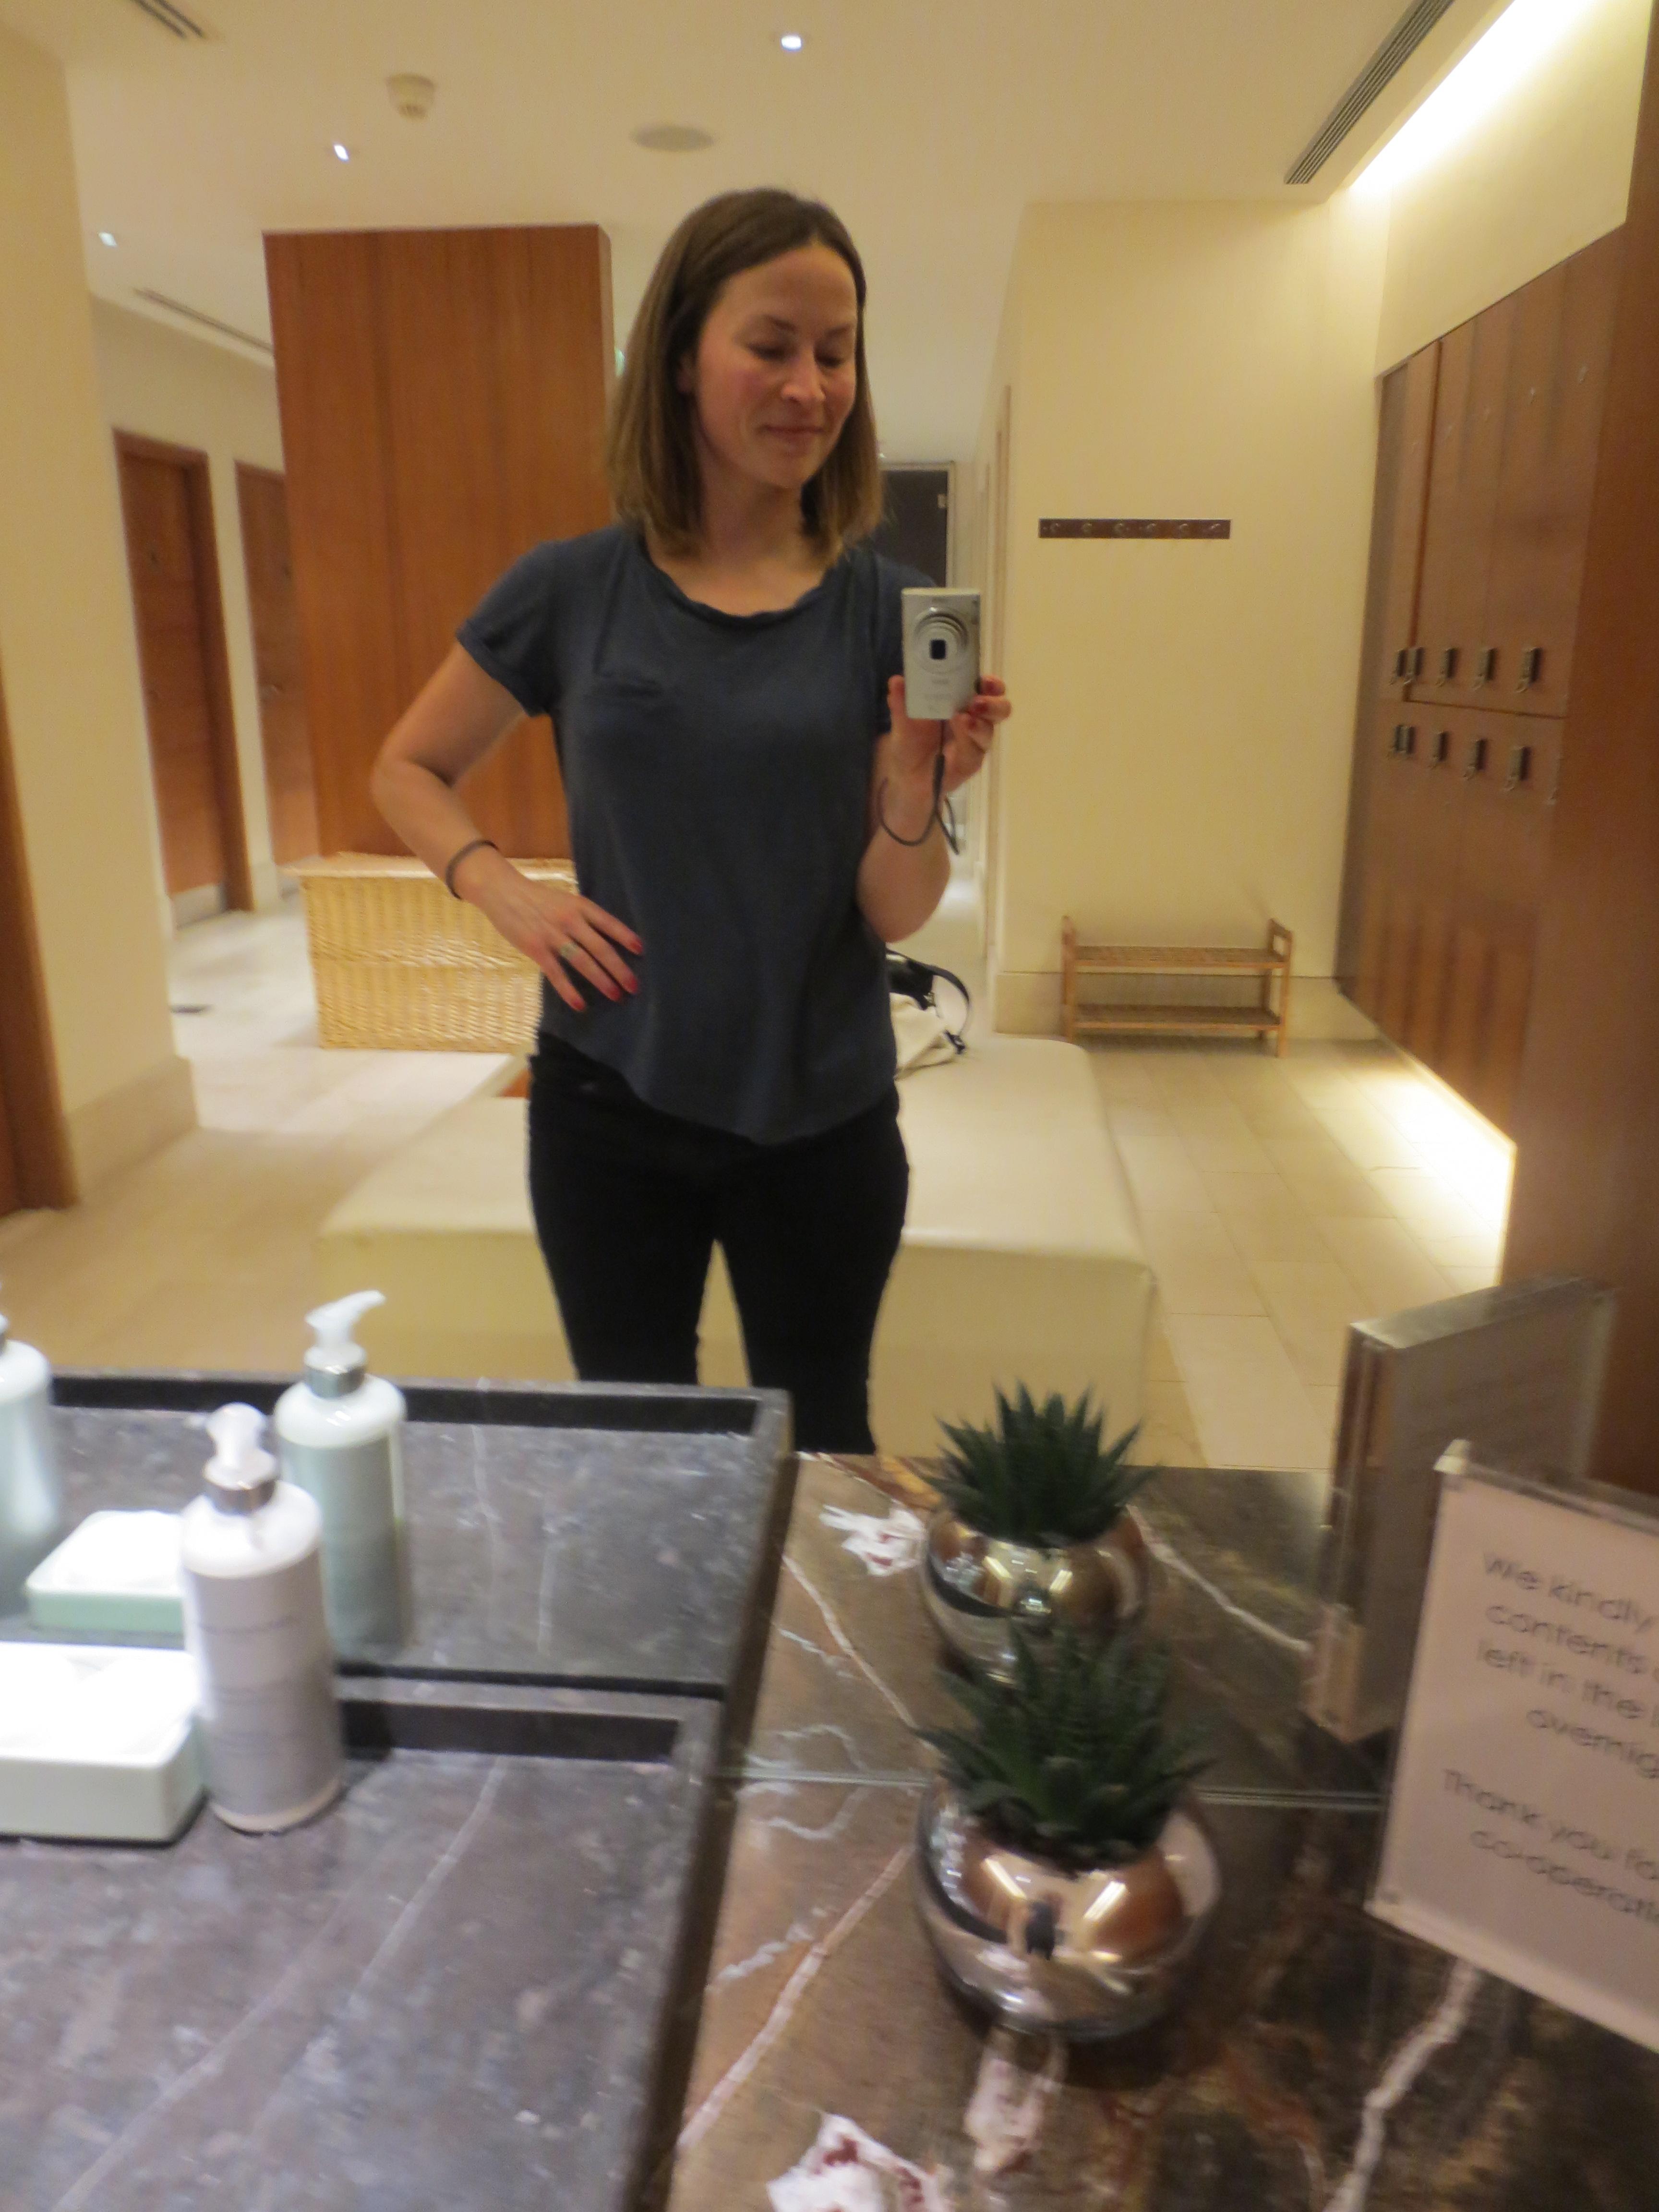 Changing room selfie!